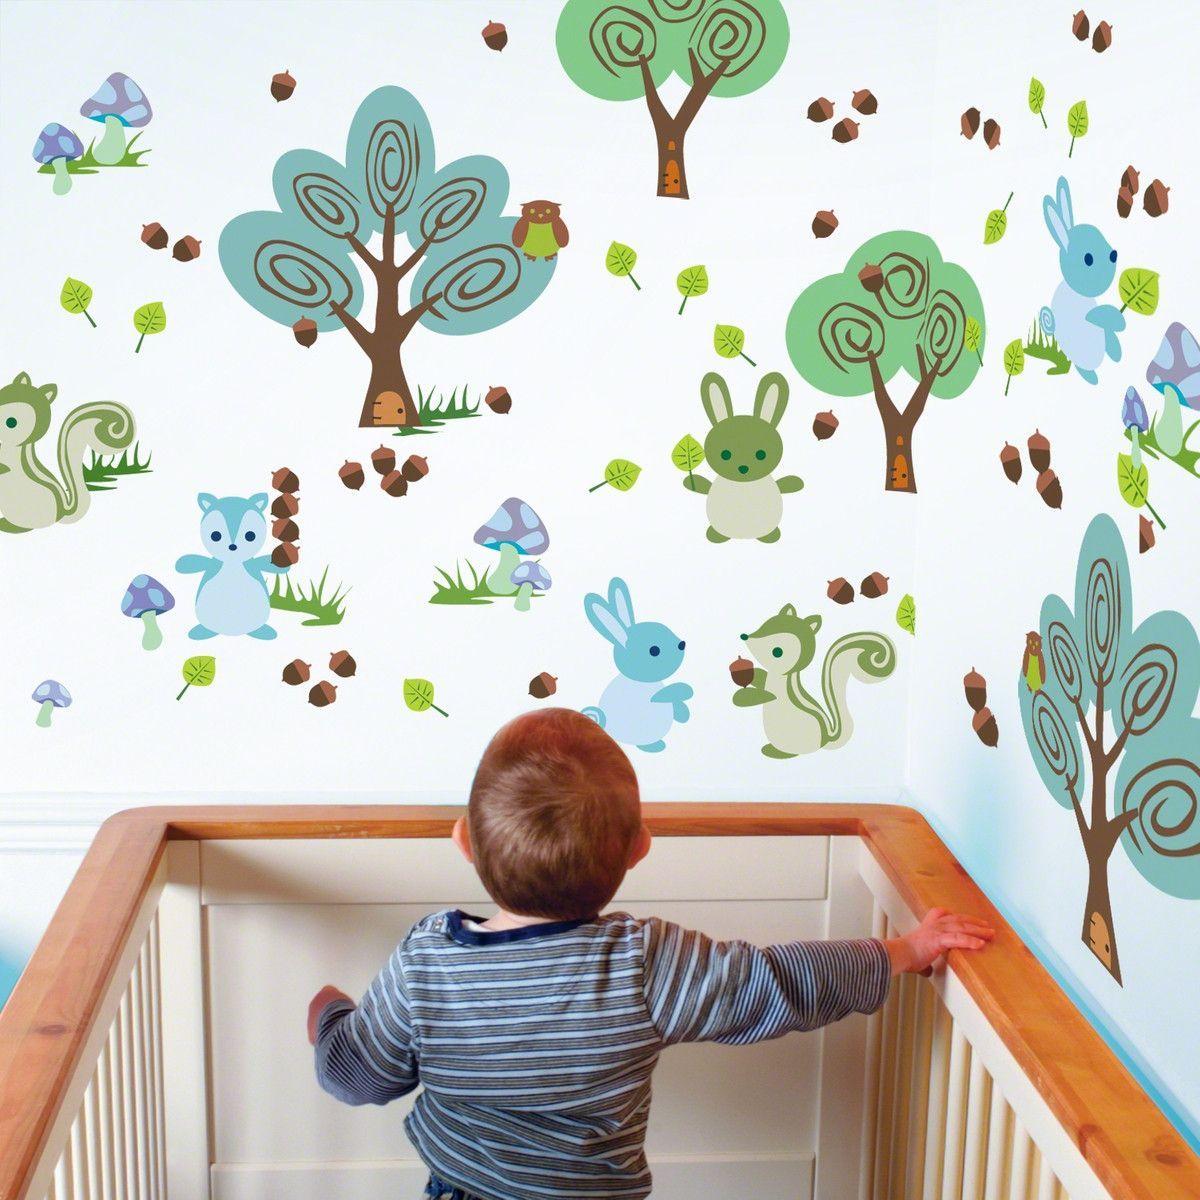 nursery prints Nursery Wall Art Forest Mushroom House nursery print nursery wall decor nursery decor nursery art nursery wall decal